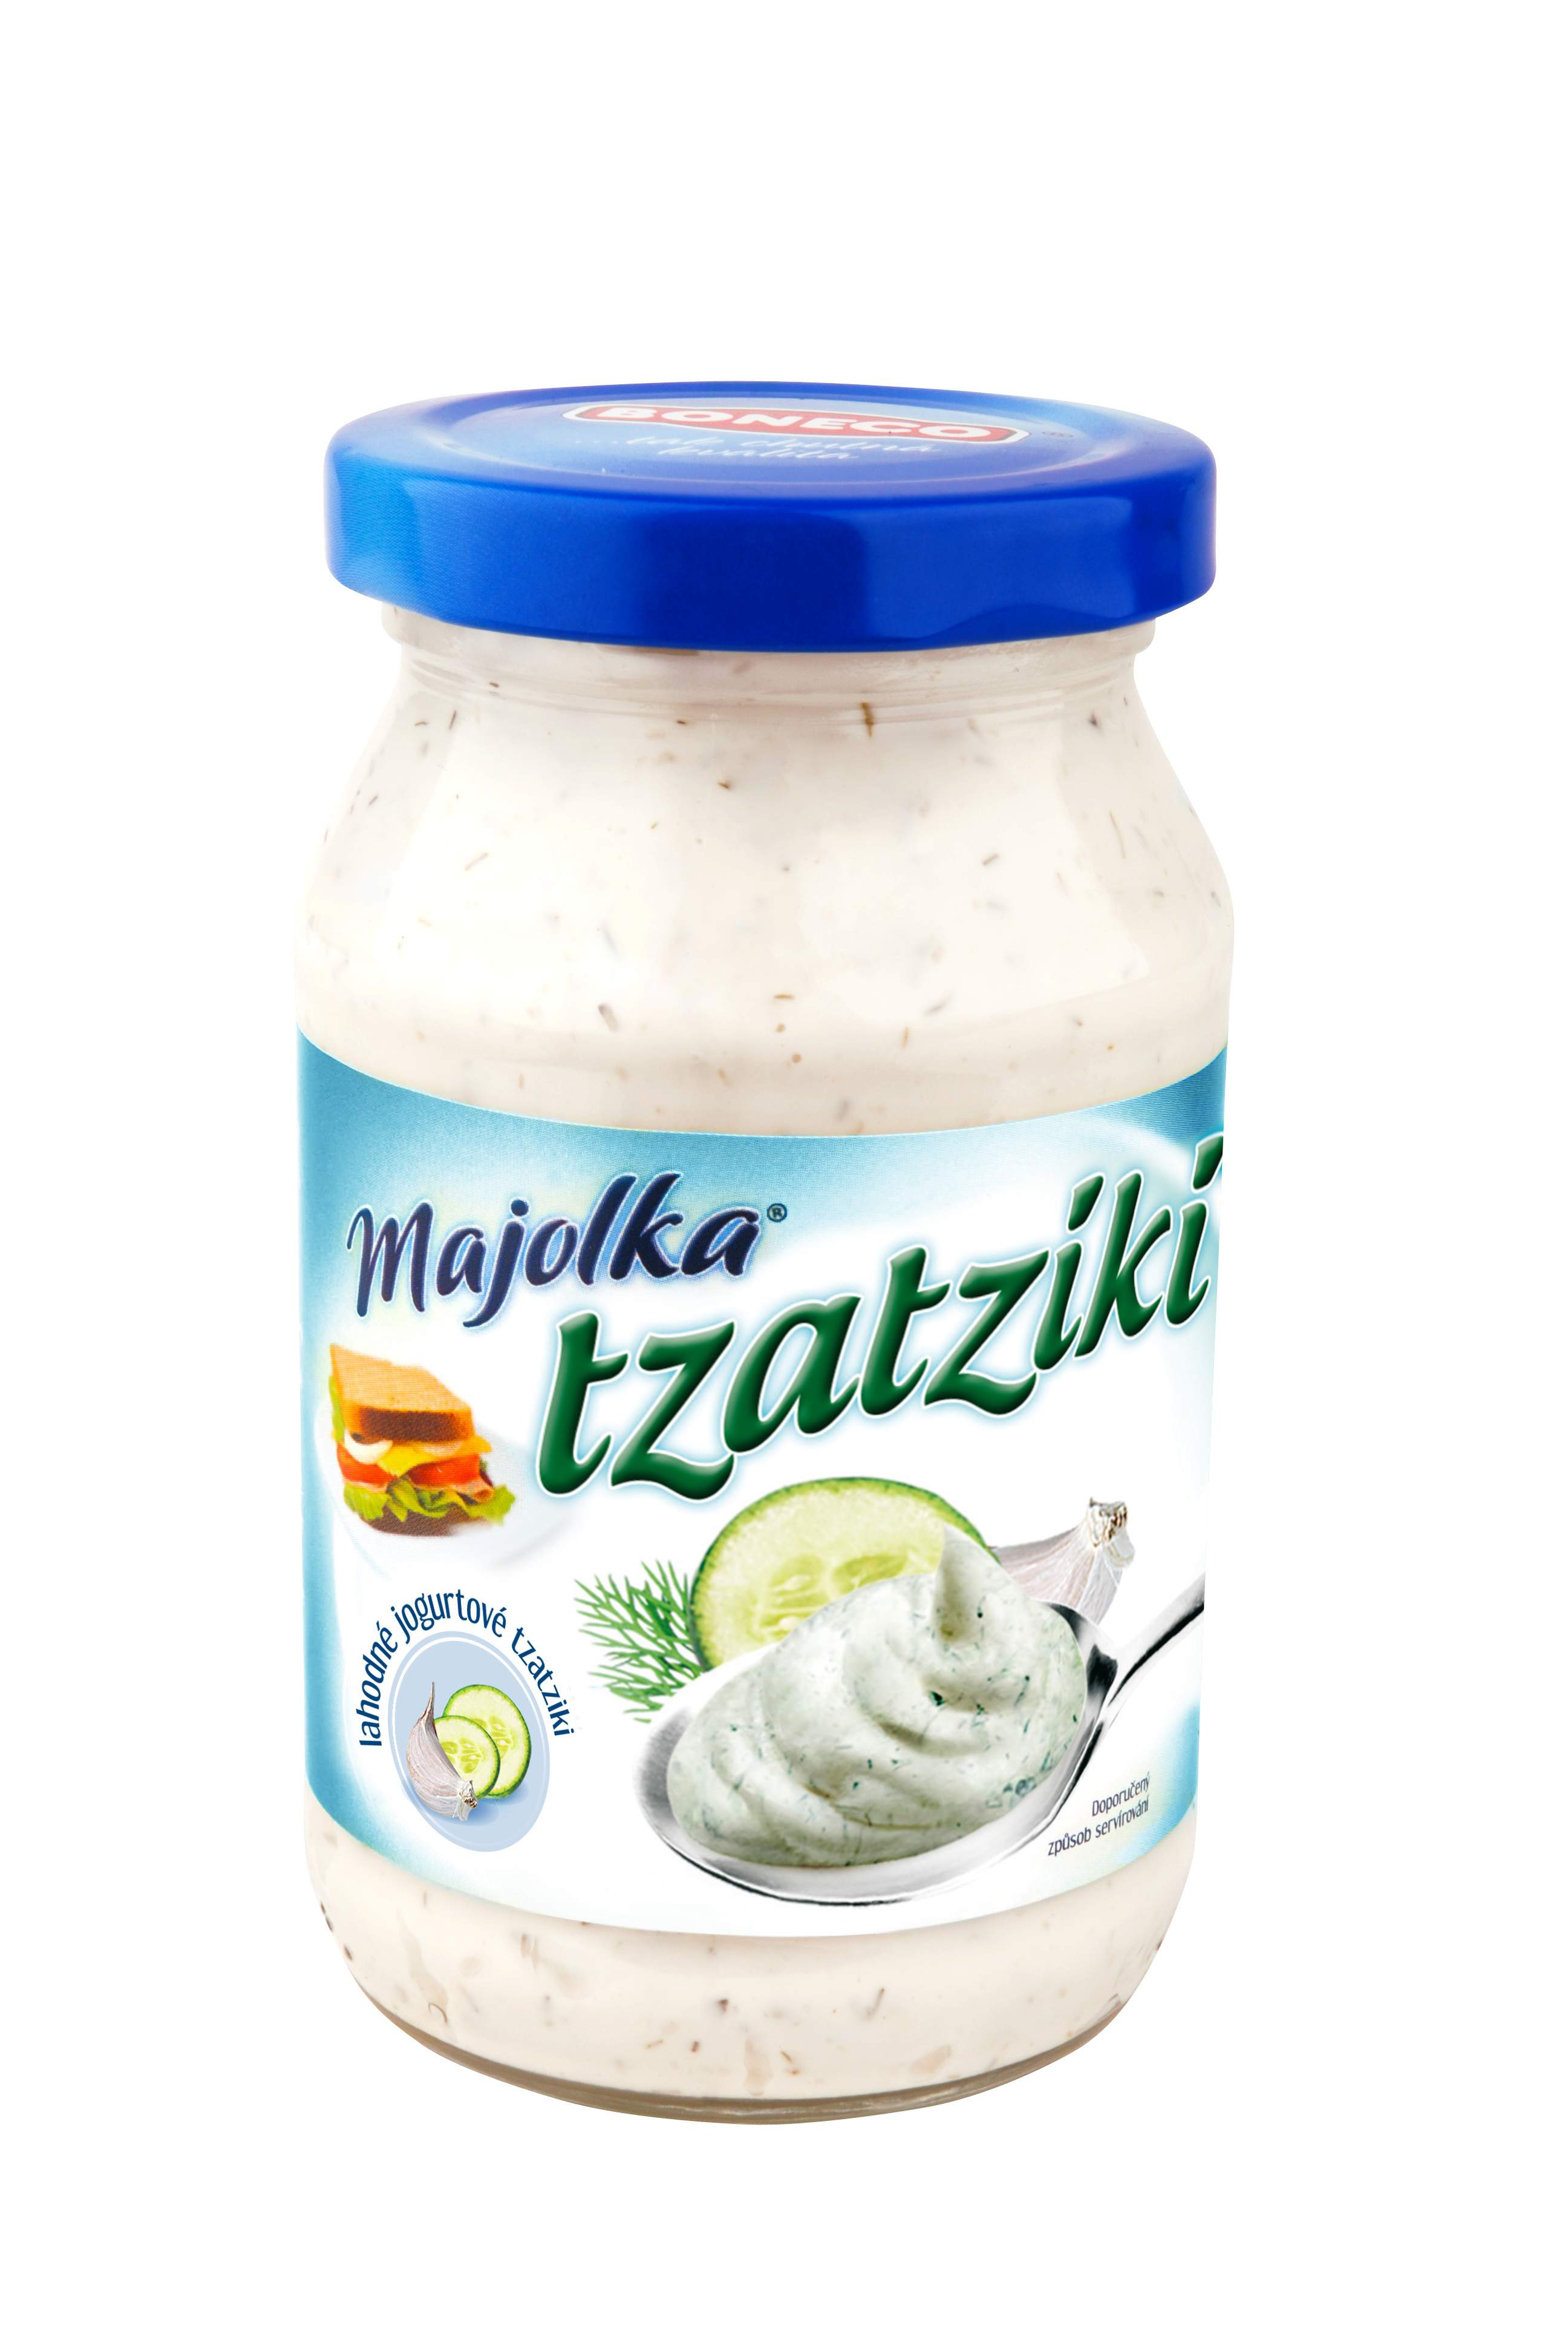 Značka Majolka jogurt.tzatziki 220ml